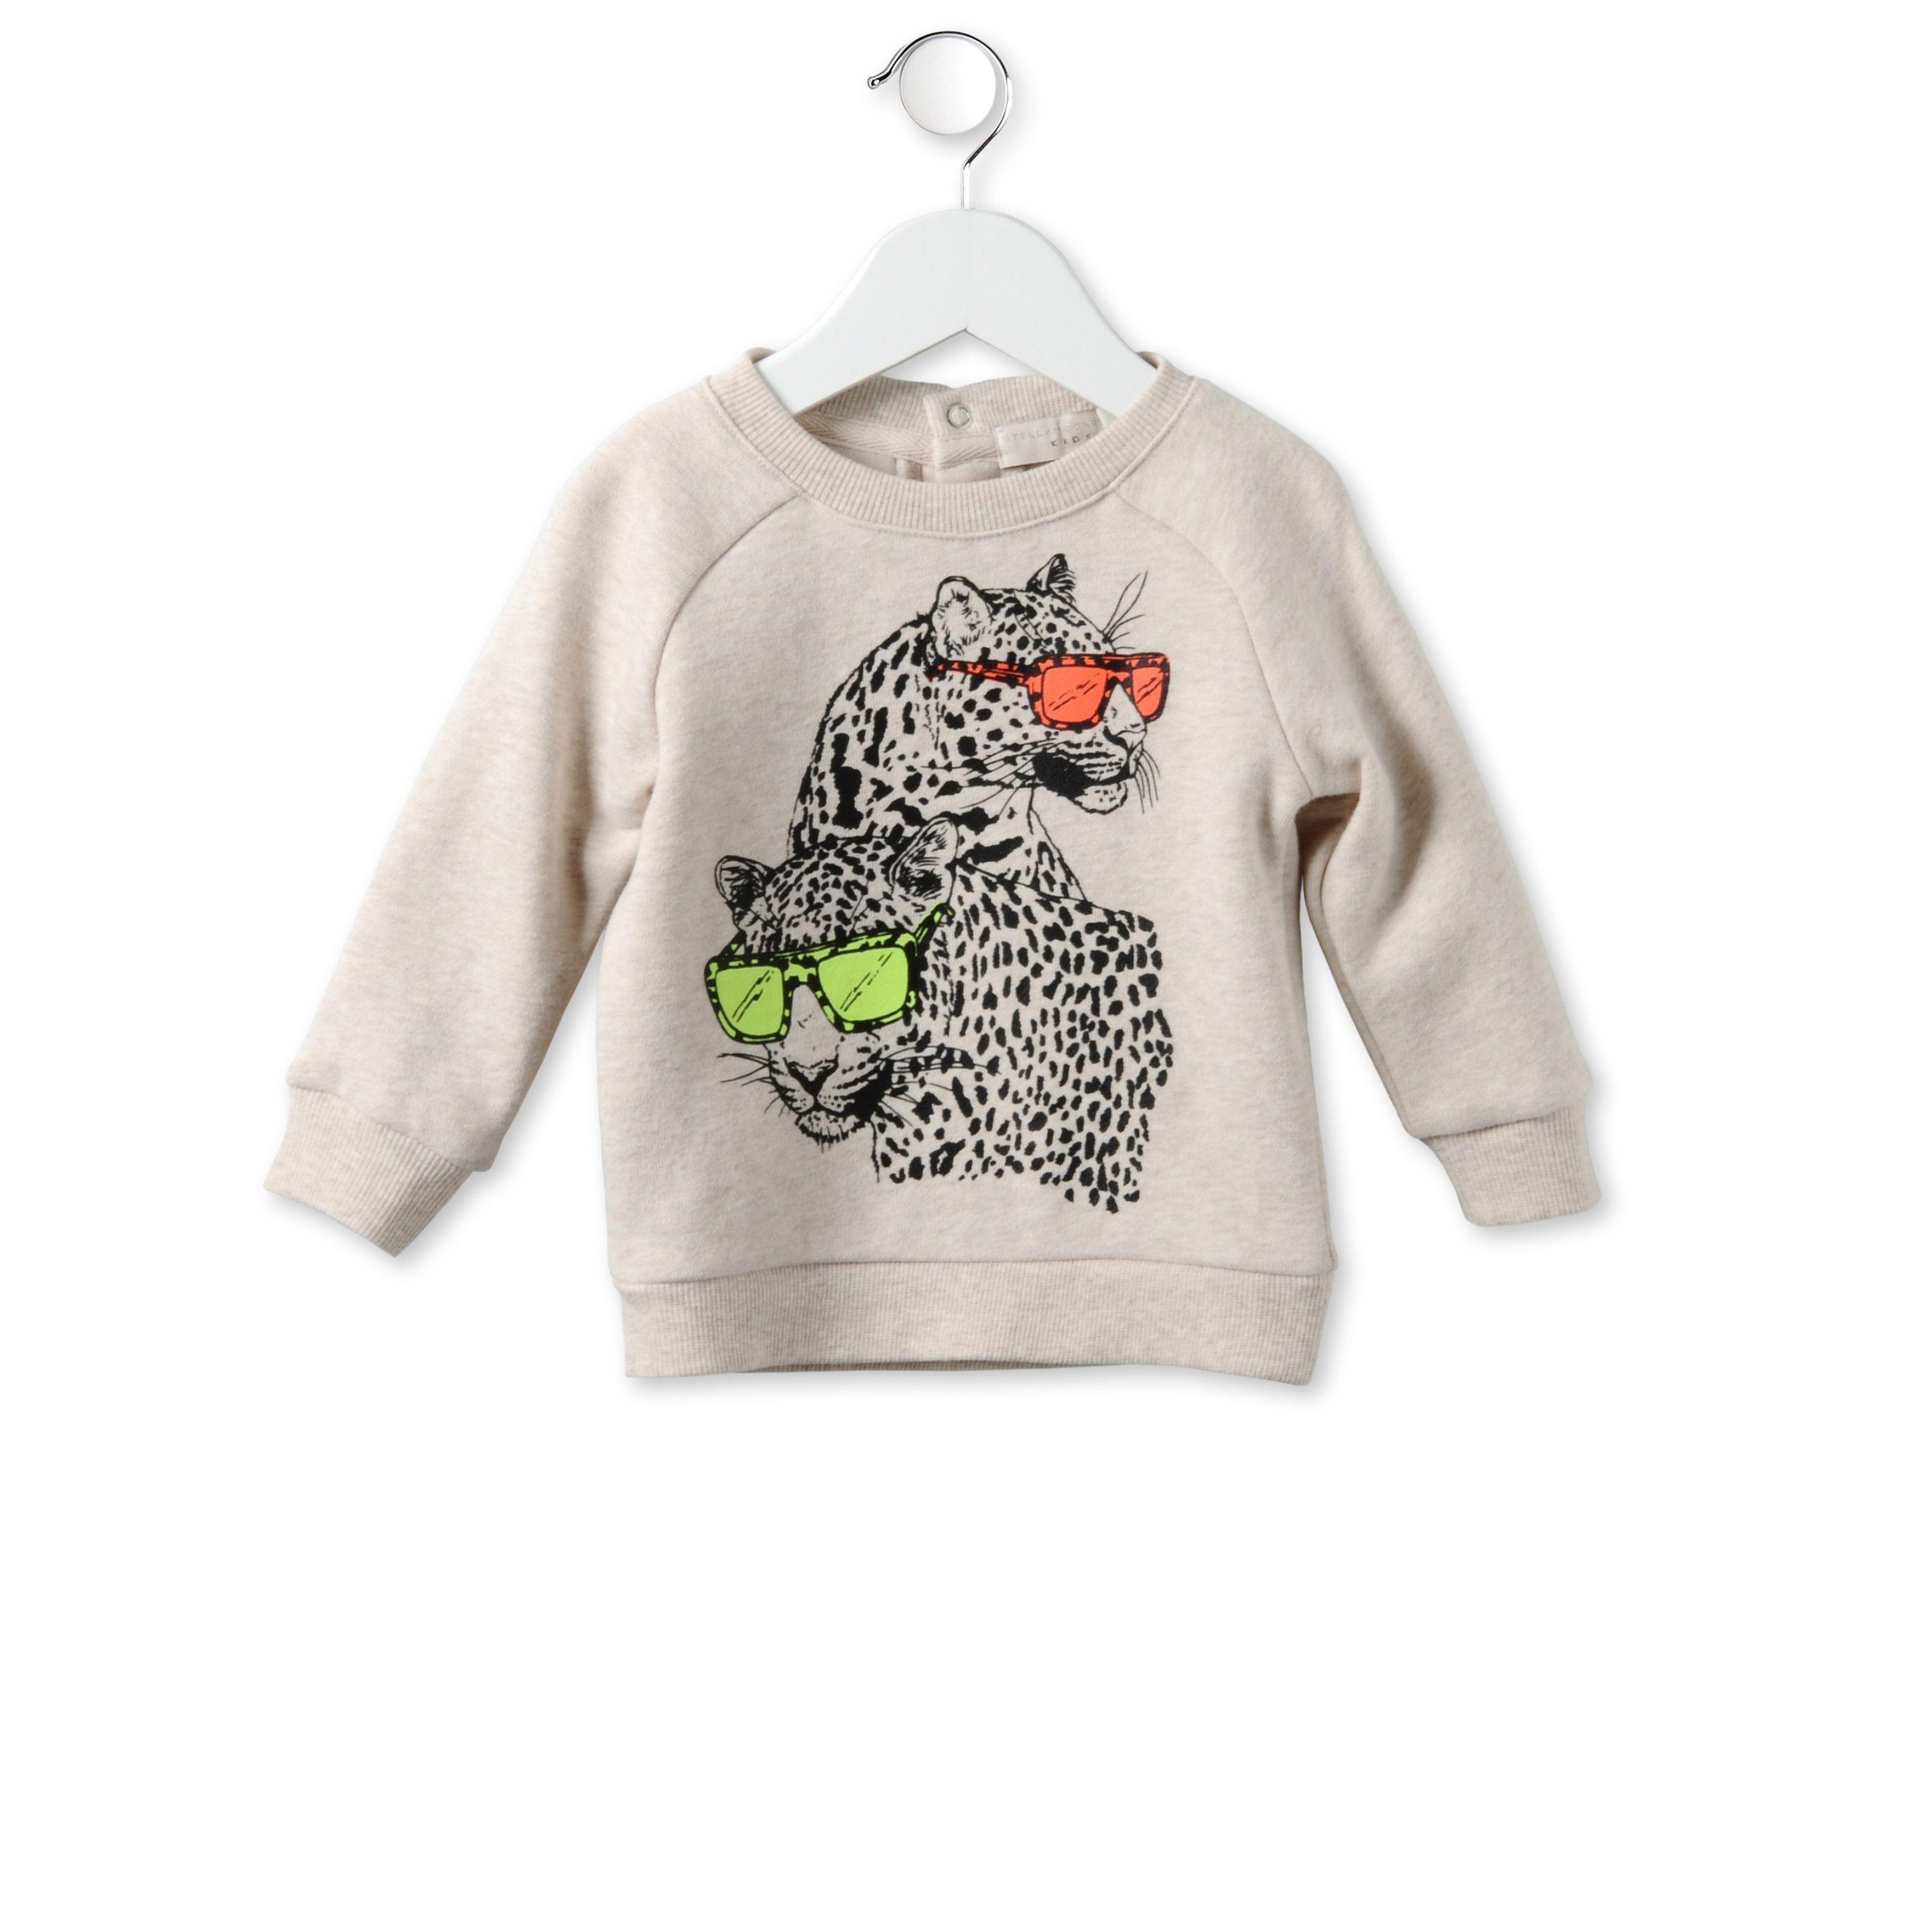 981234d0e90c8 Sweat Shirt Billy Crème Avec Imprimé Léopard - Stella Mccartney Kids ...